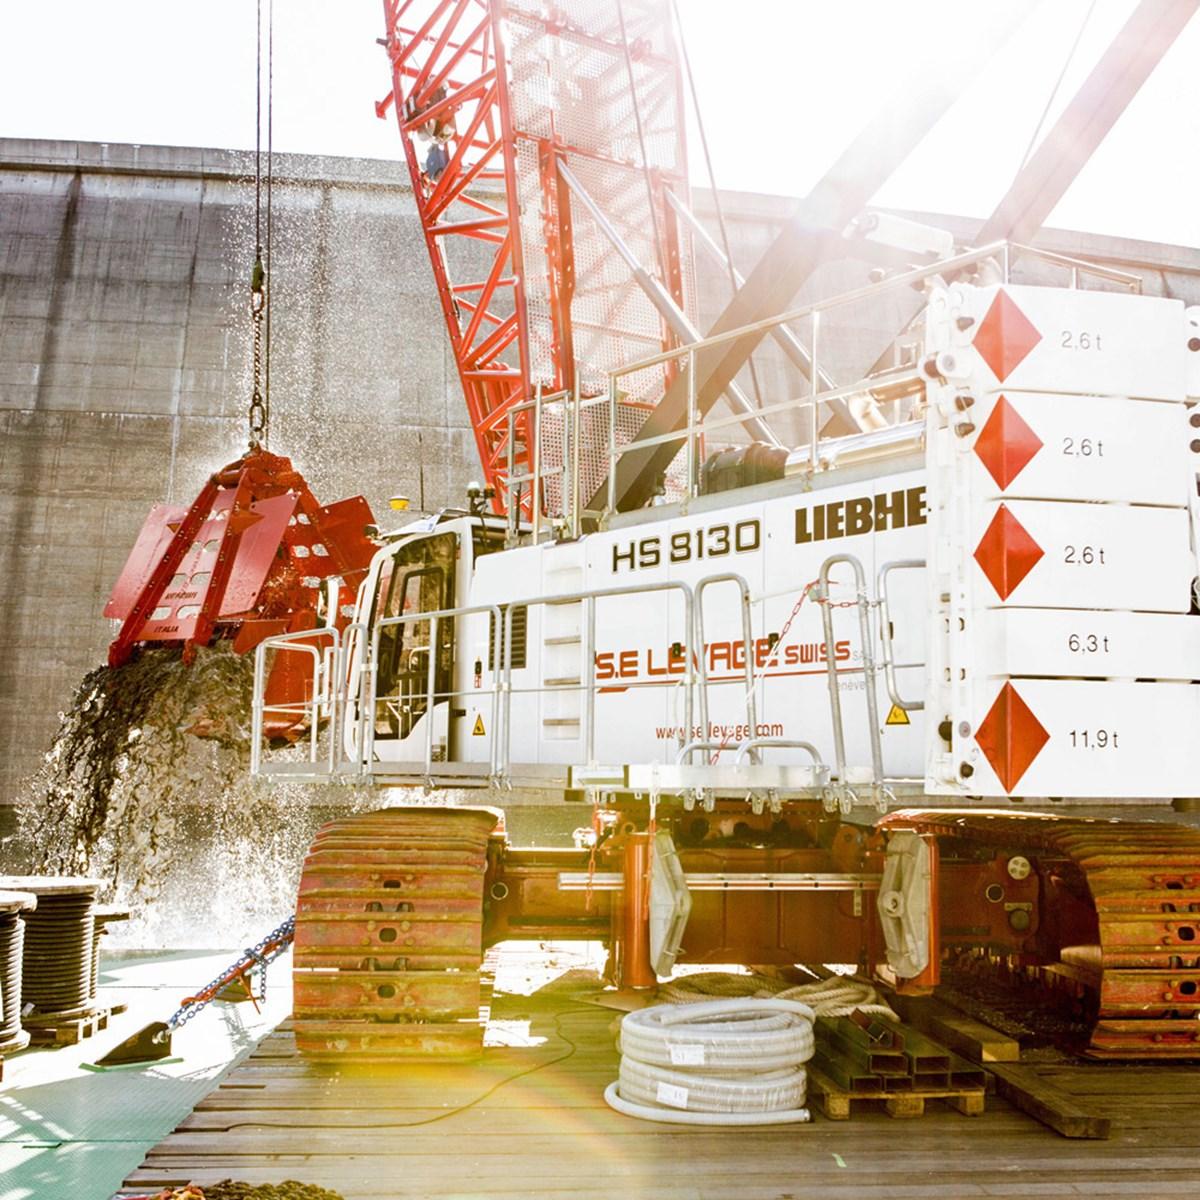 liebherr-hs-8130-duty-cycle-crawler-crane-dredging-bucket-negrini-clamshell.jpg